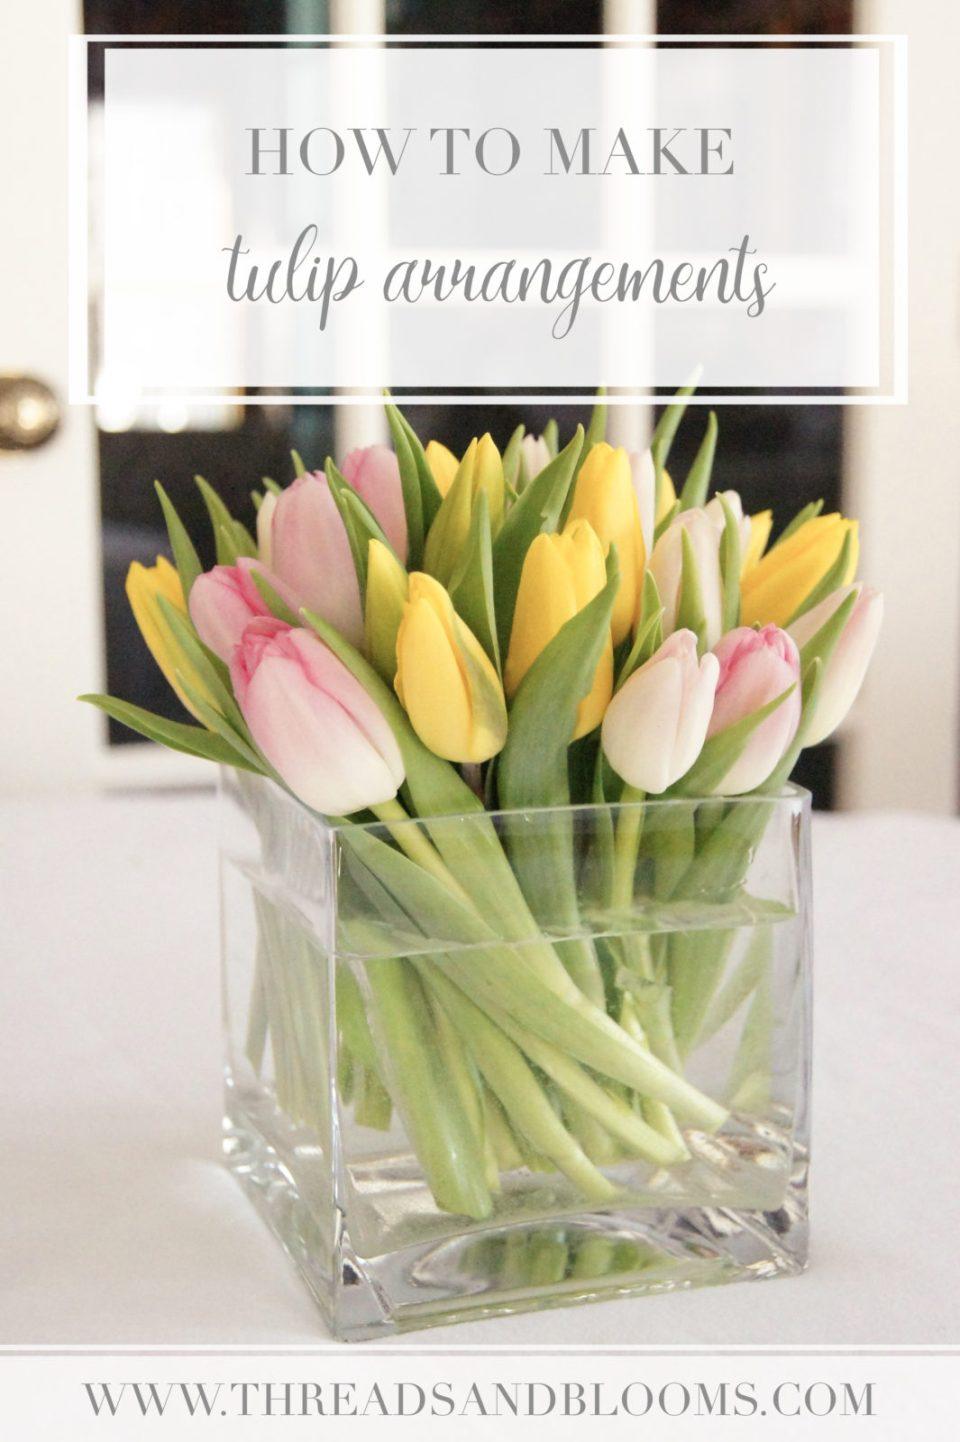 4 Tulip Arrangements Step By Step How To Make A Tulip Arrangement